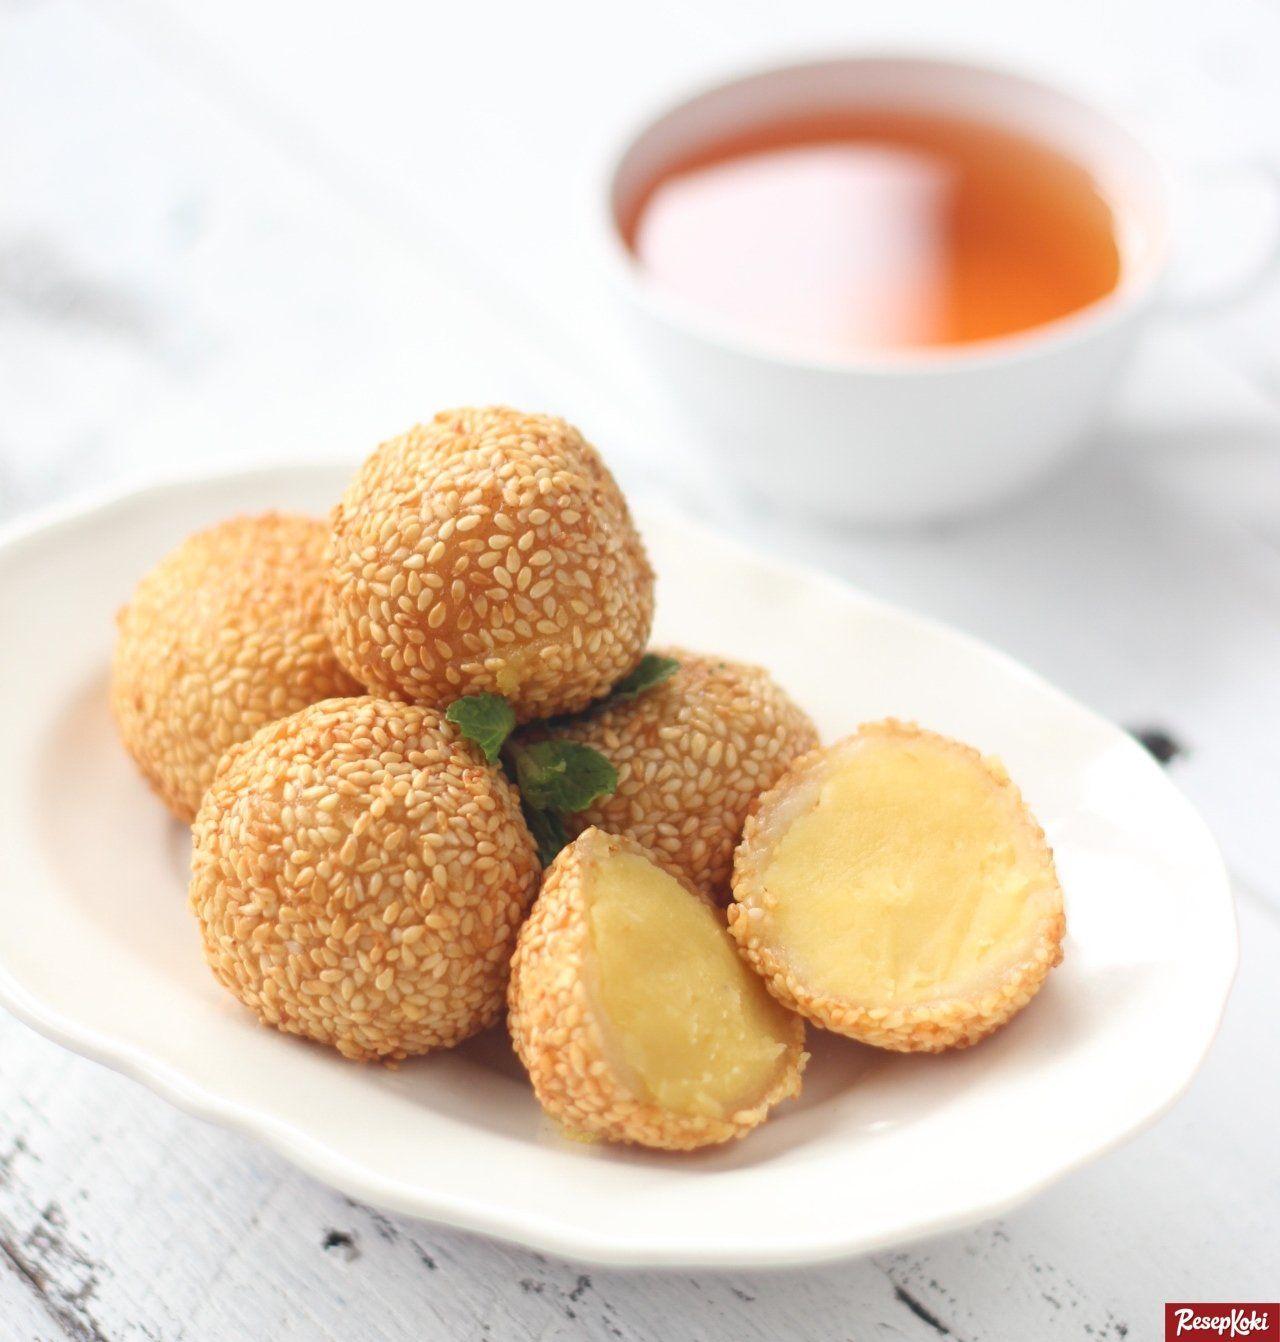 Onde Onde Mekar Bulat Sempurna Dan Simpel Resep Resepkoki Resep Di 2020 Resep Makanan Resep Masakan Resep